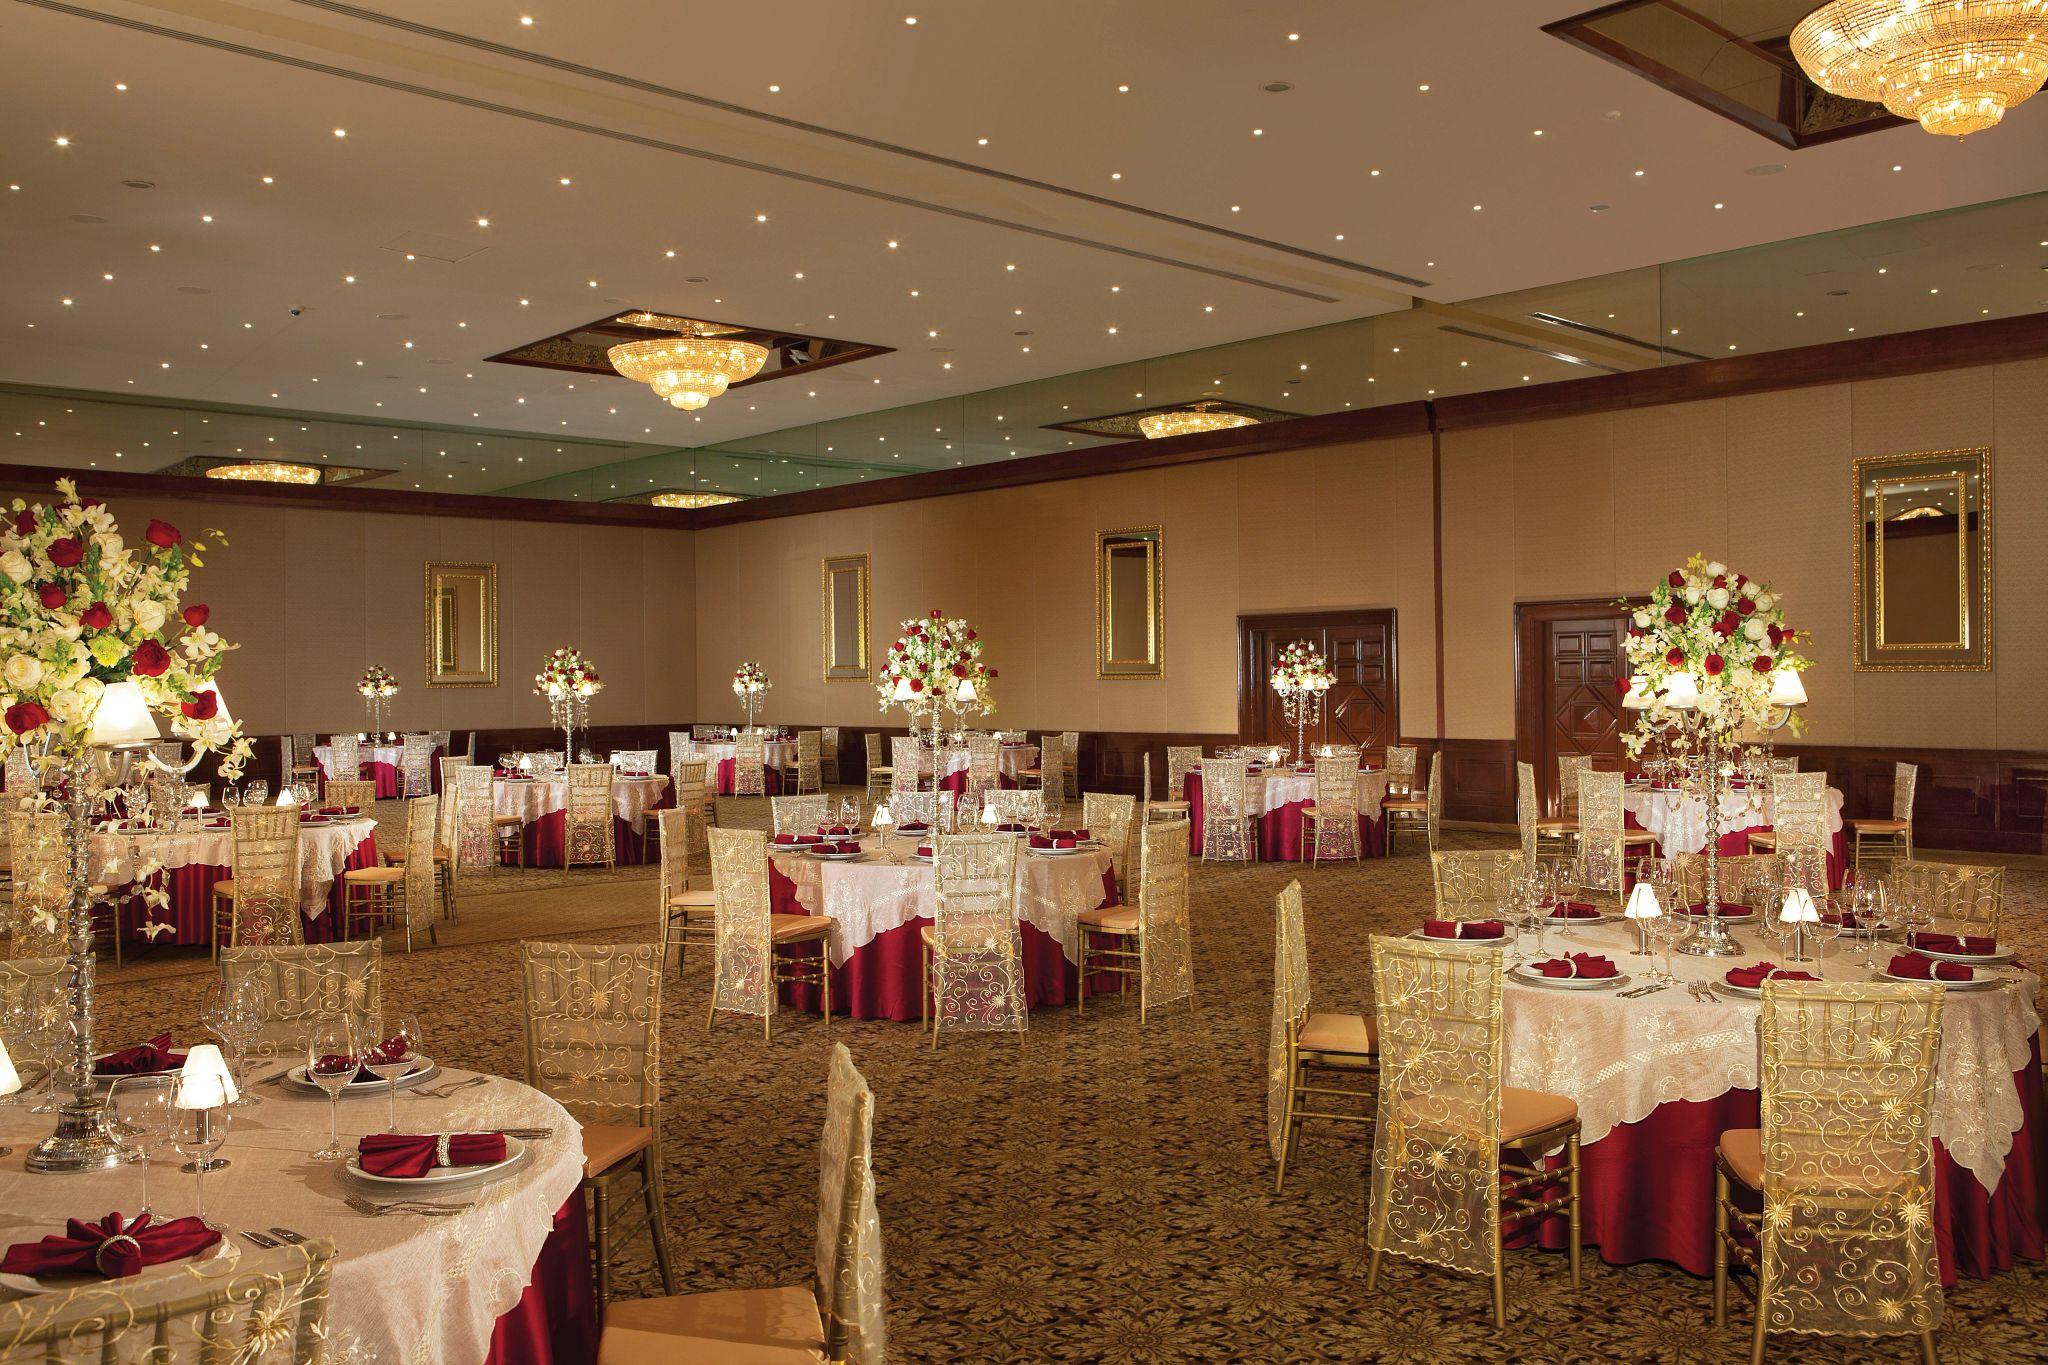 ballroom set up fro a wedding reception